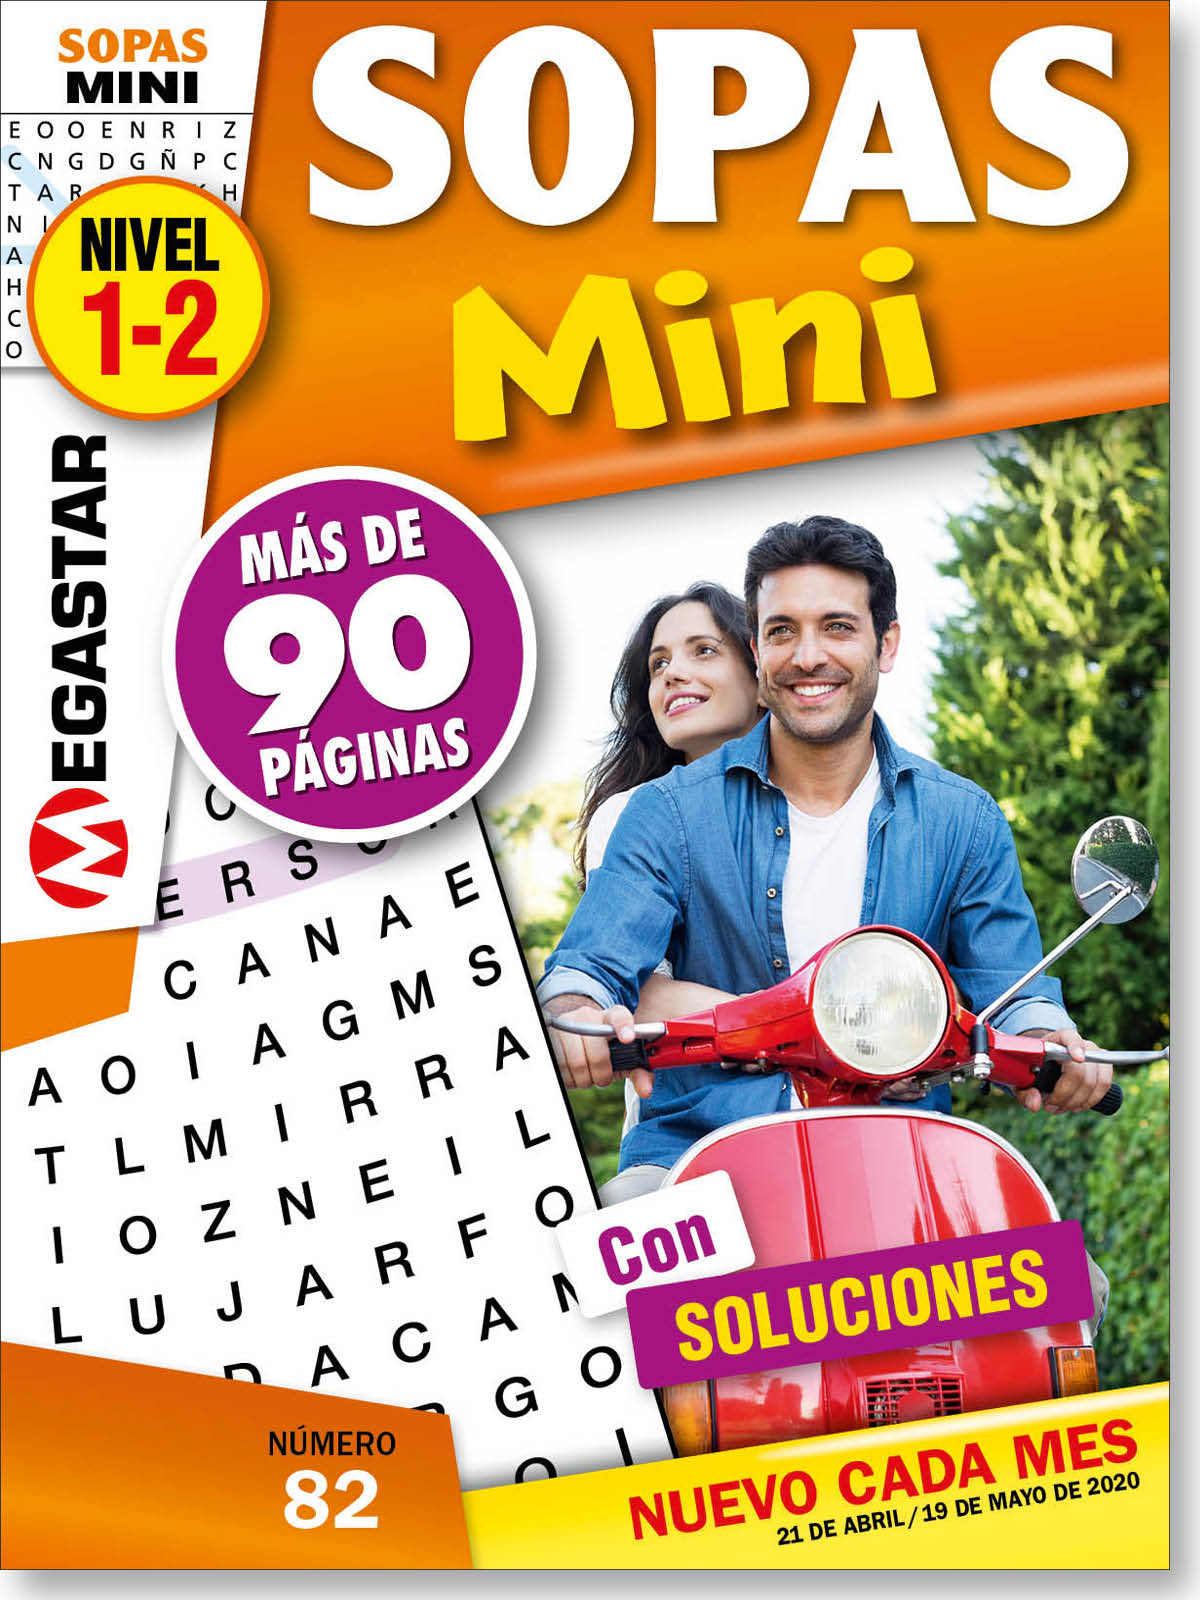 Sopas Mini 1-2